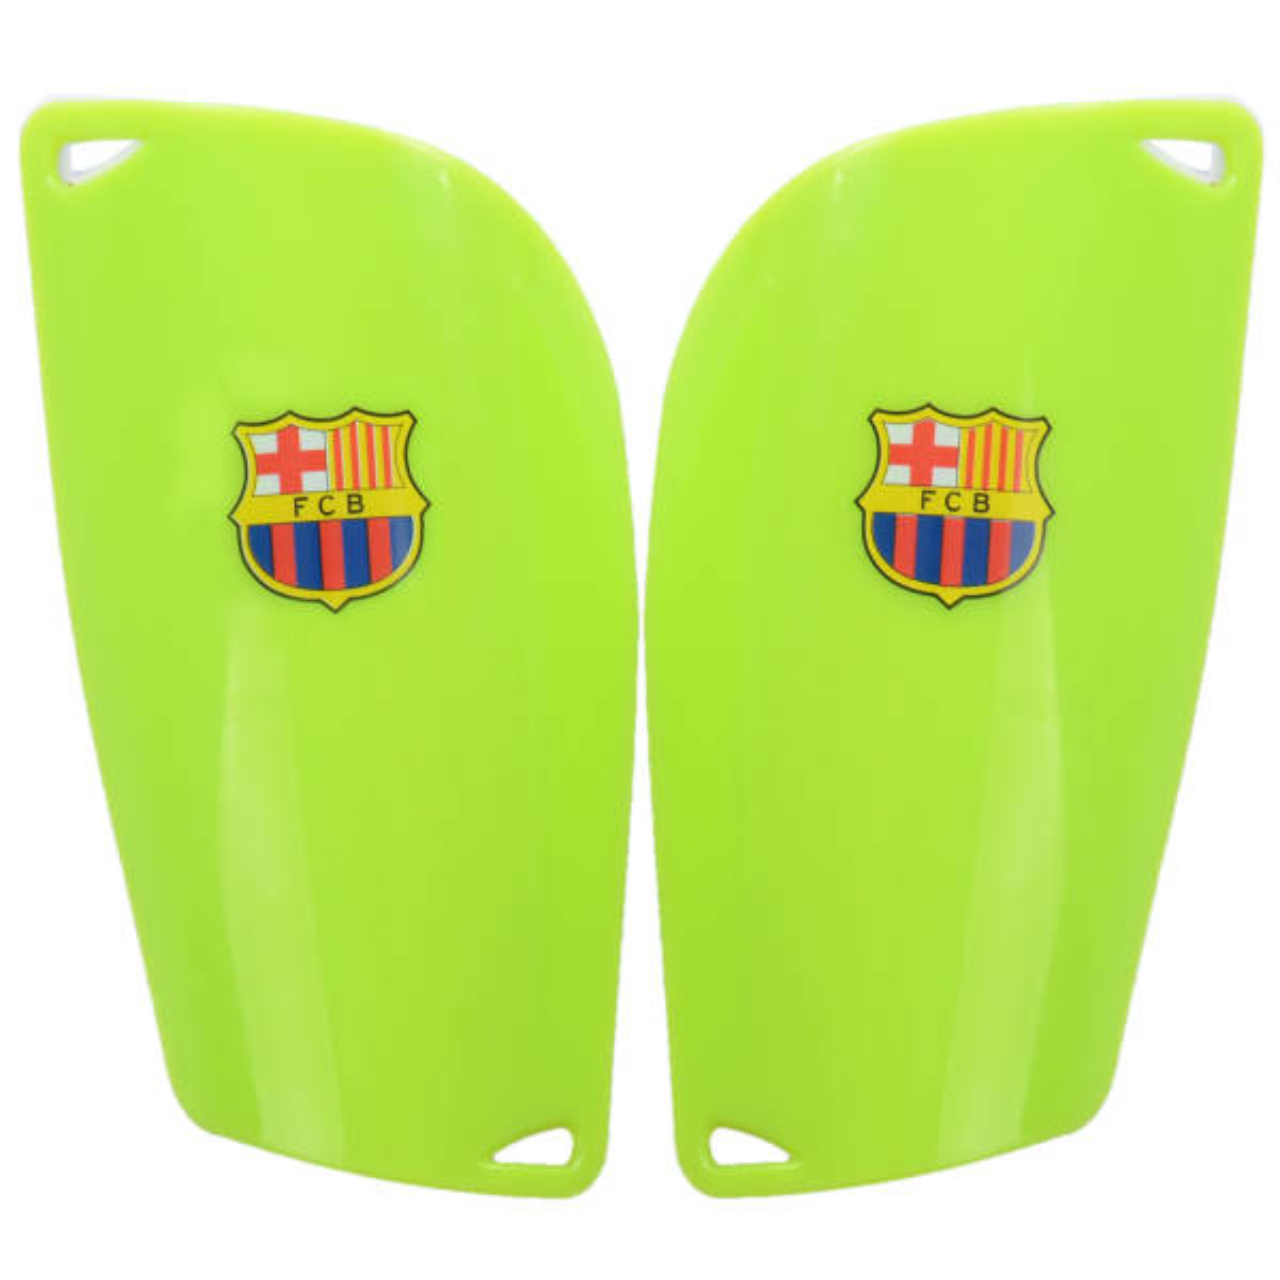 ساق بند فوتبال طرح بارسلونا مدل KFU بسته 2 عددی